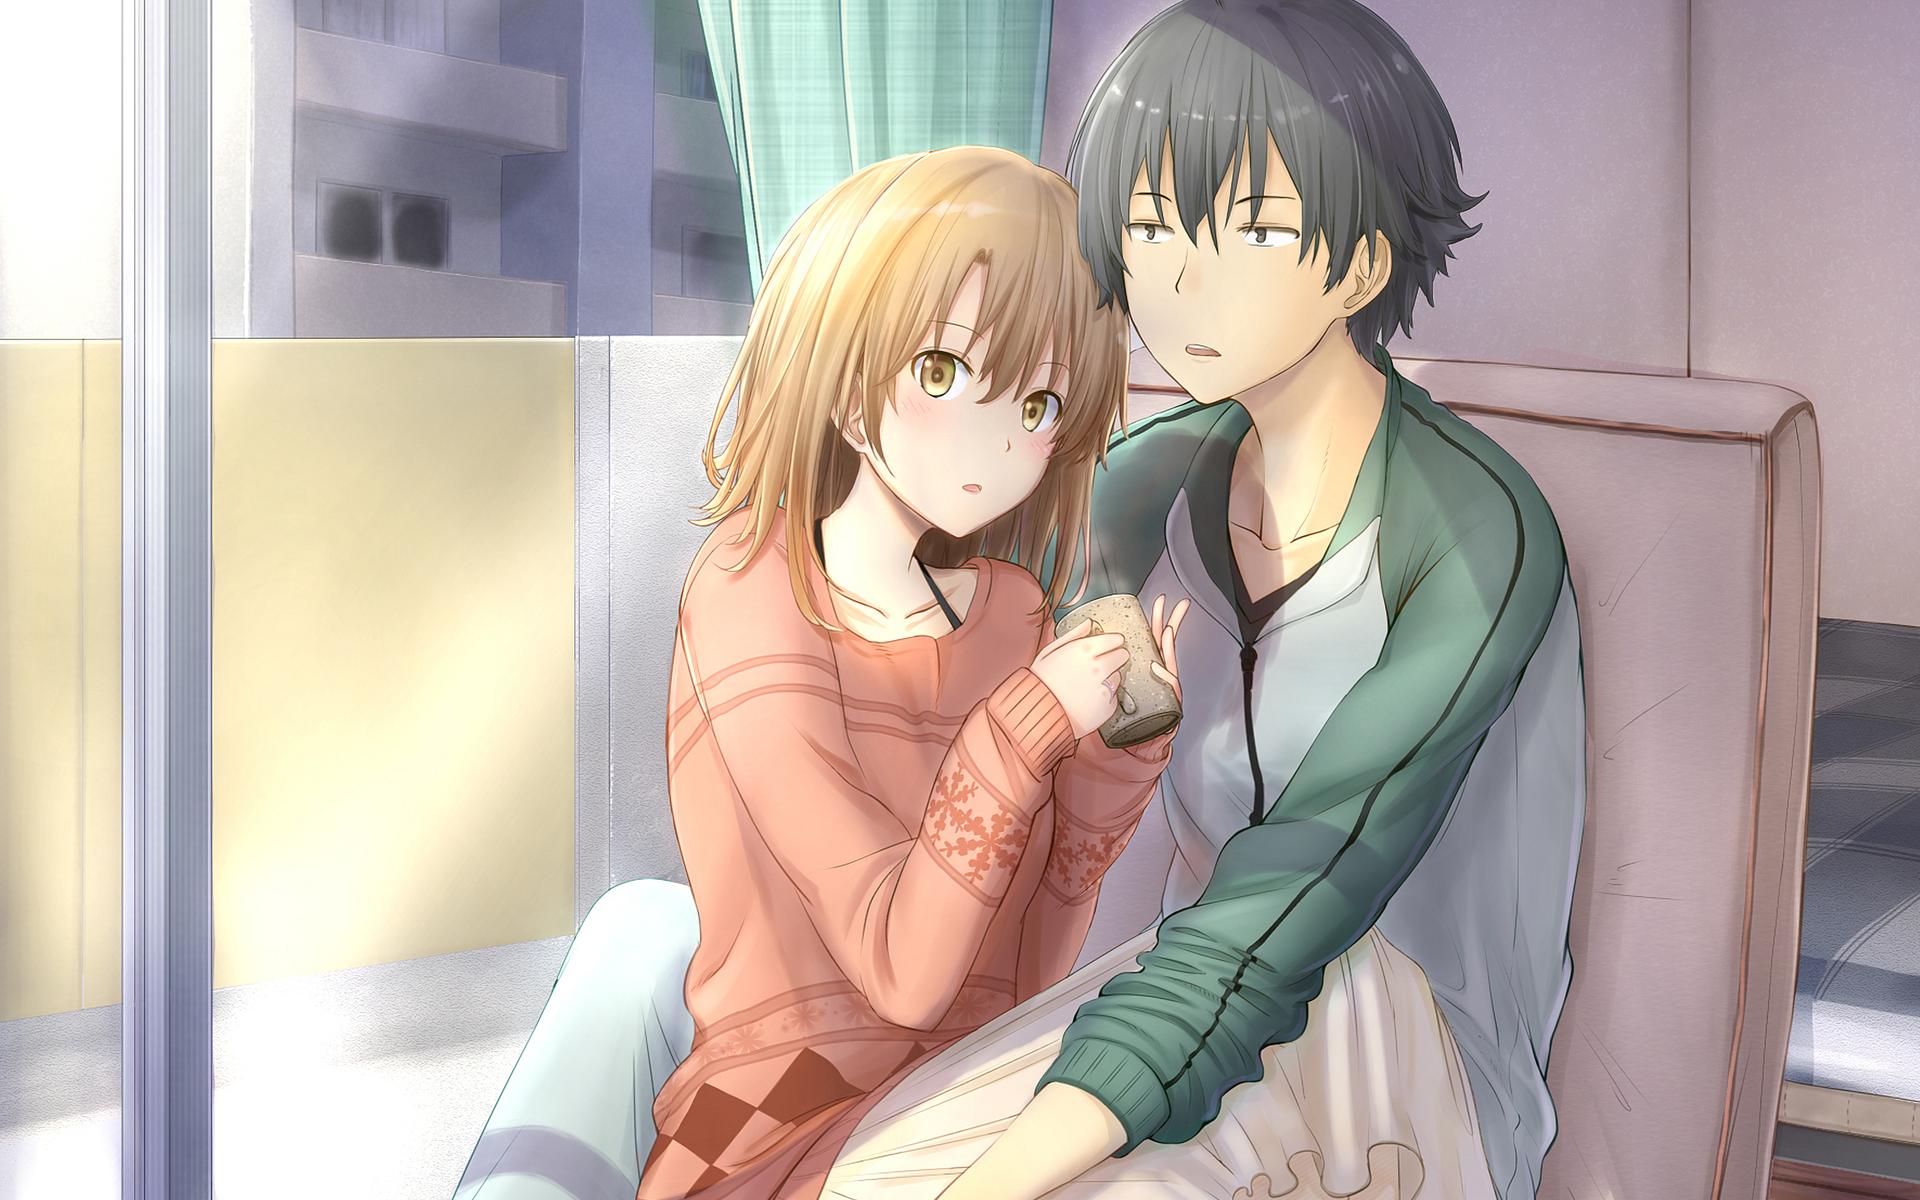 Best Anime Wallpaper Kami: My Teenage Romantic Comedy ...